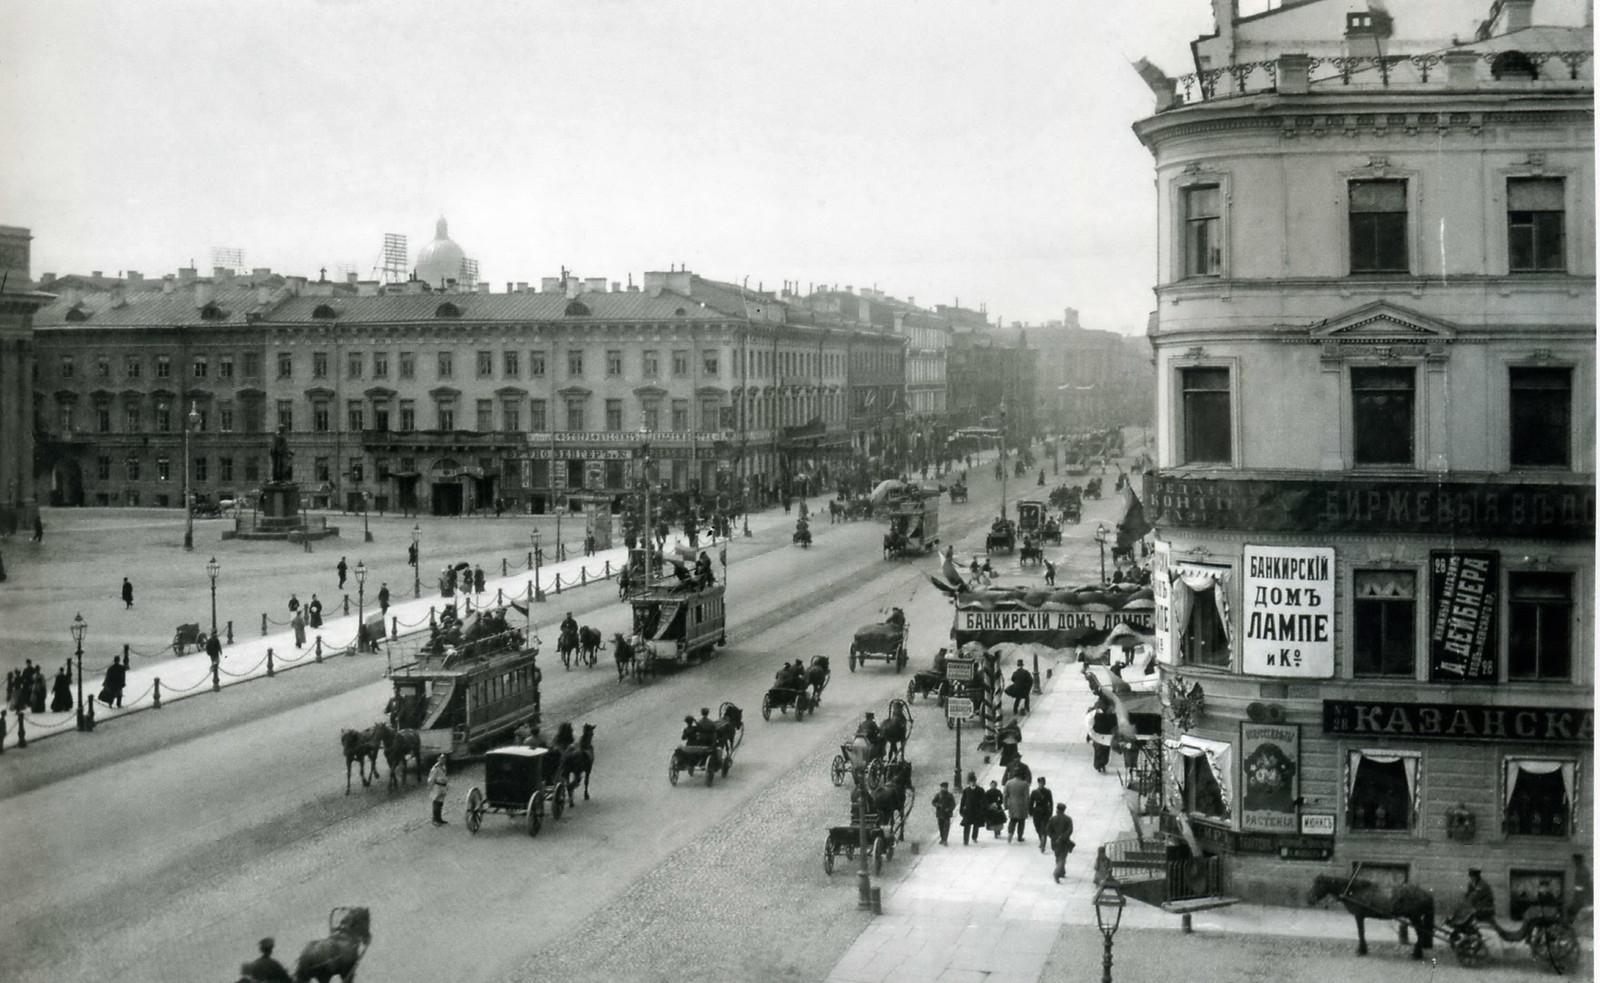 St. Petersburg, Nevsky prospect, where Korovko had his main office